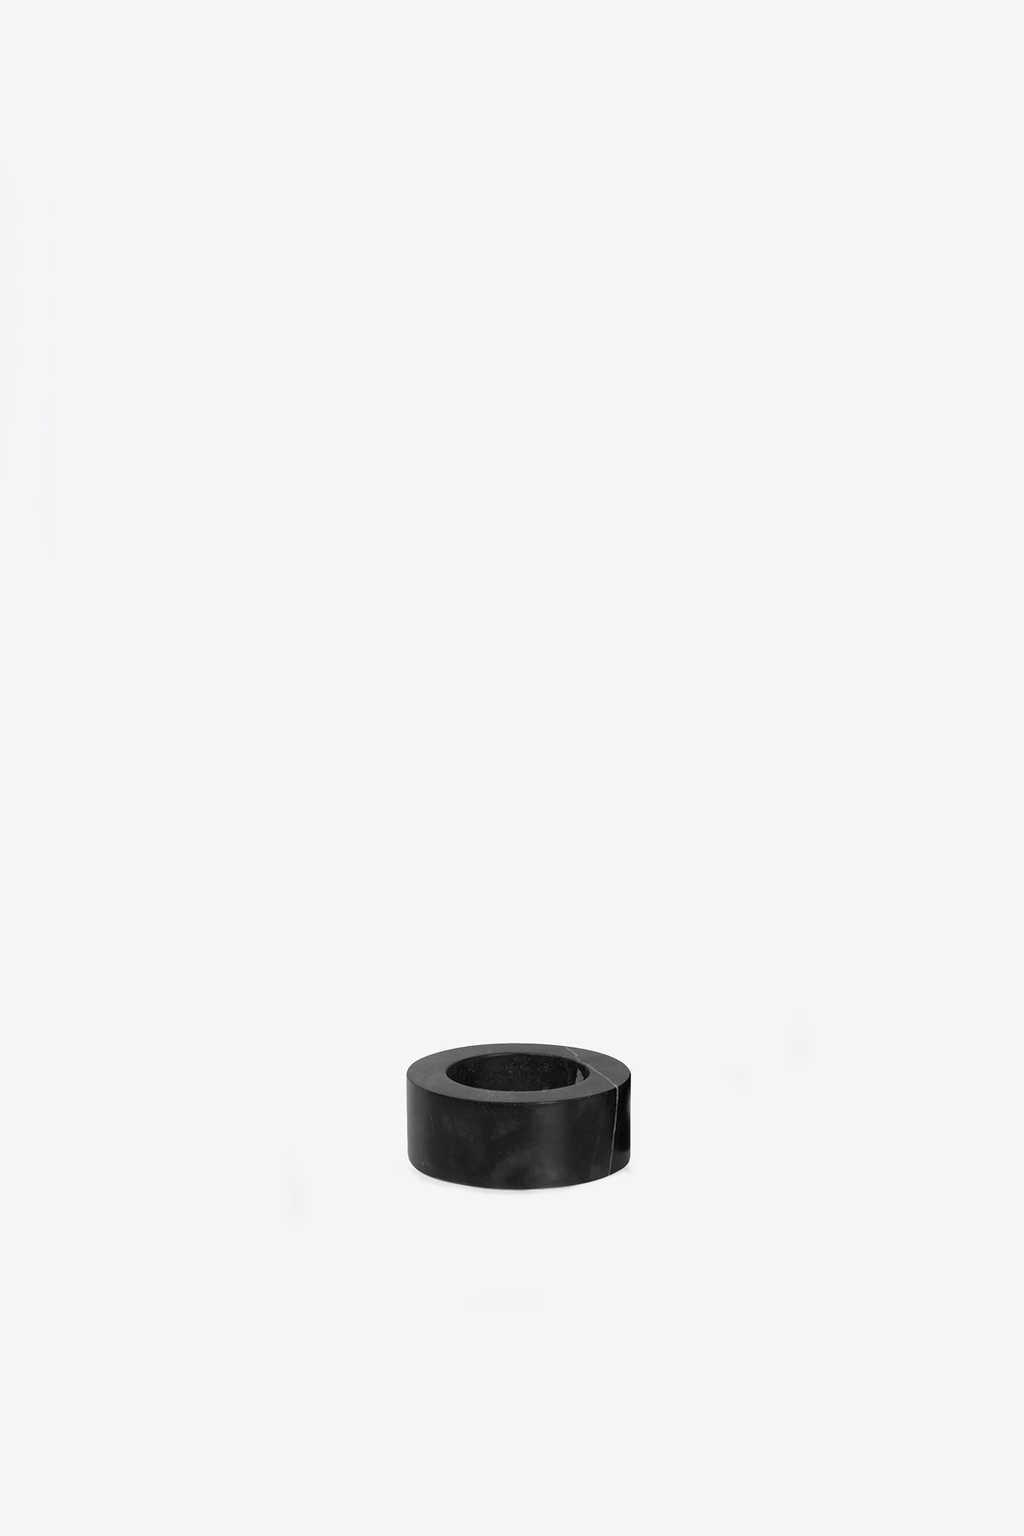 Tealight Candle Holder 1875 Black 3